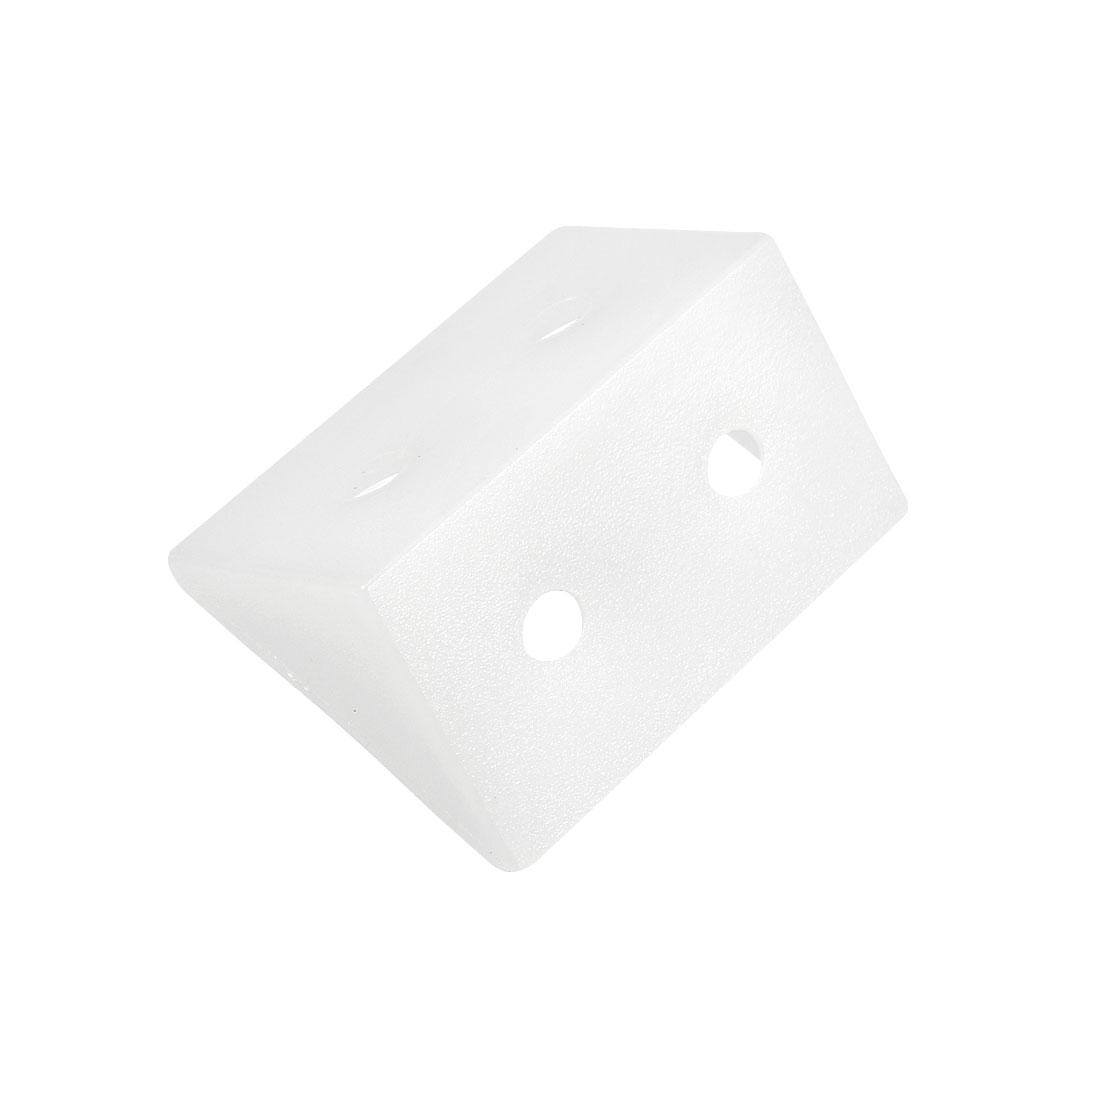 Shelf Cabinet Door 90 Degree Plastic Corner Braces 4 Holes Angle Bracket, 30 Pcs